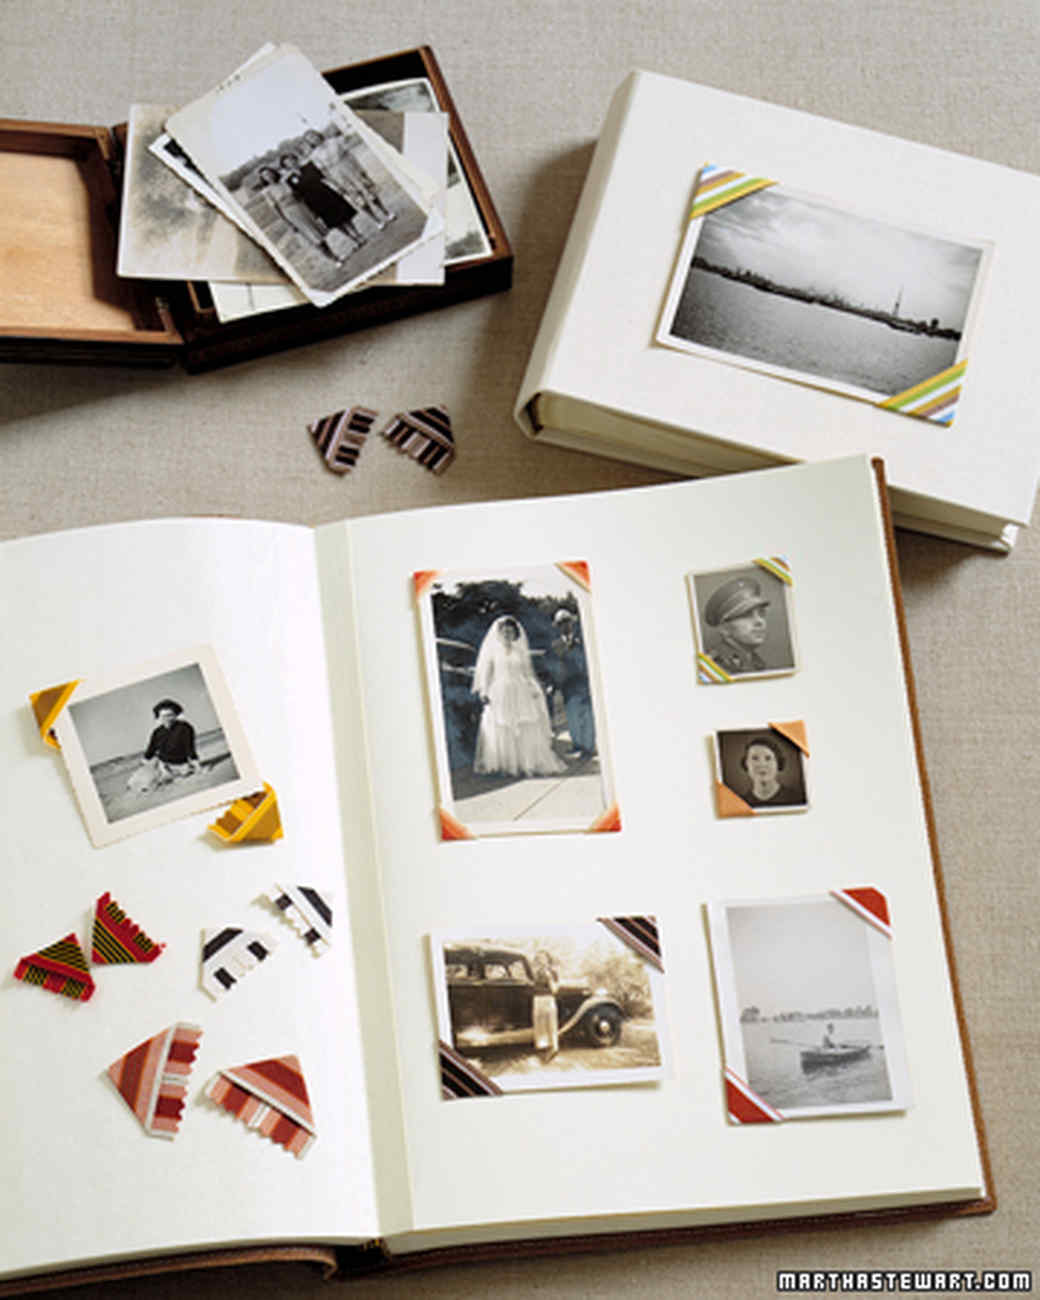 35 great scrapbook ideas and albums | martha stewart